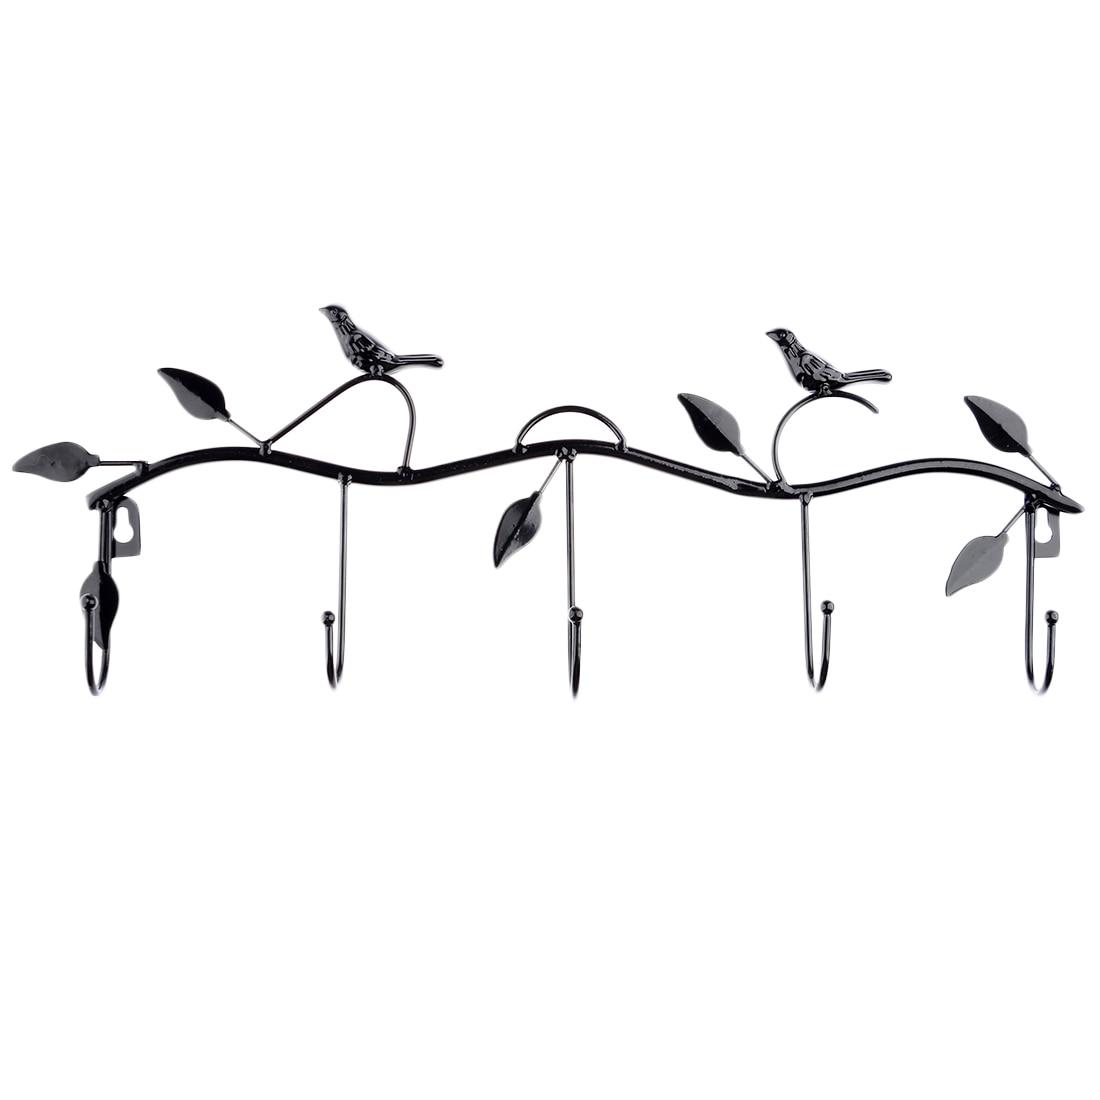 Home Decore Tree Branch & Birds Style Metal 5 Hooks Wall Mount Hook Hanger Rack Holder For Coat Clothing Towel Shelves- Black